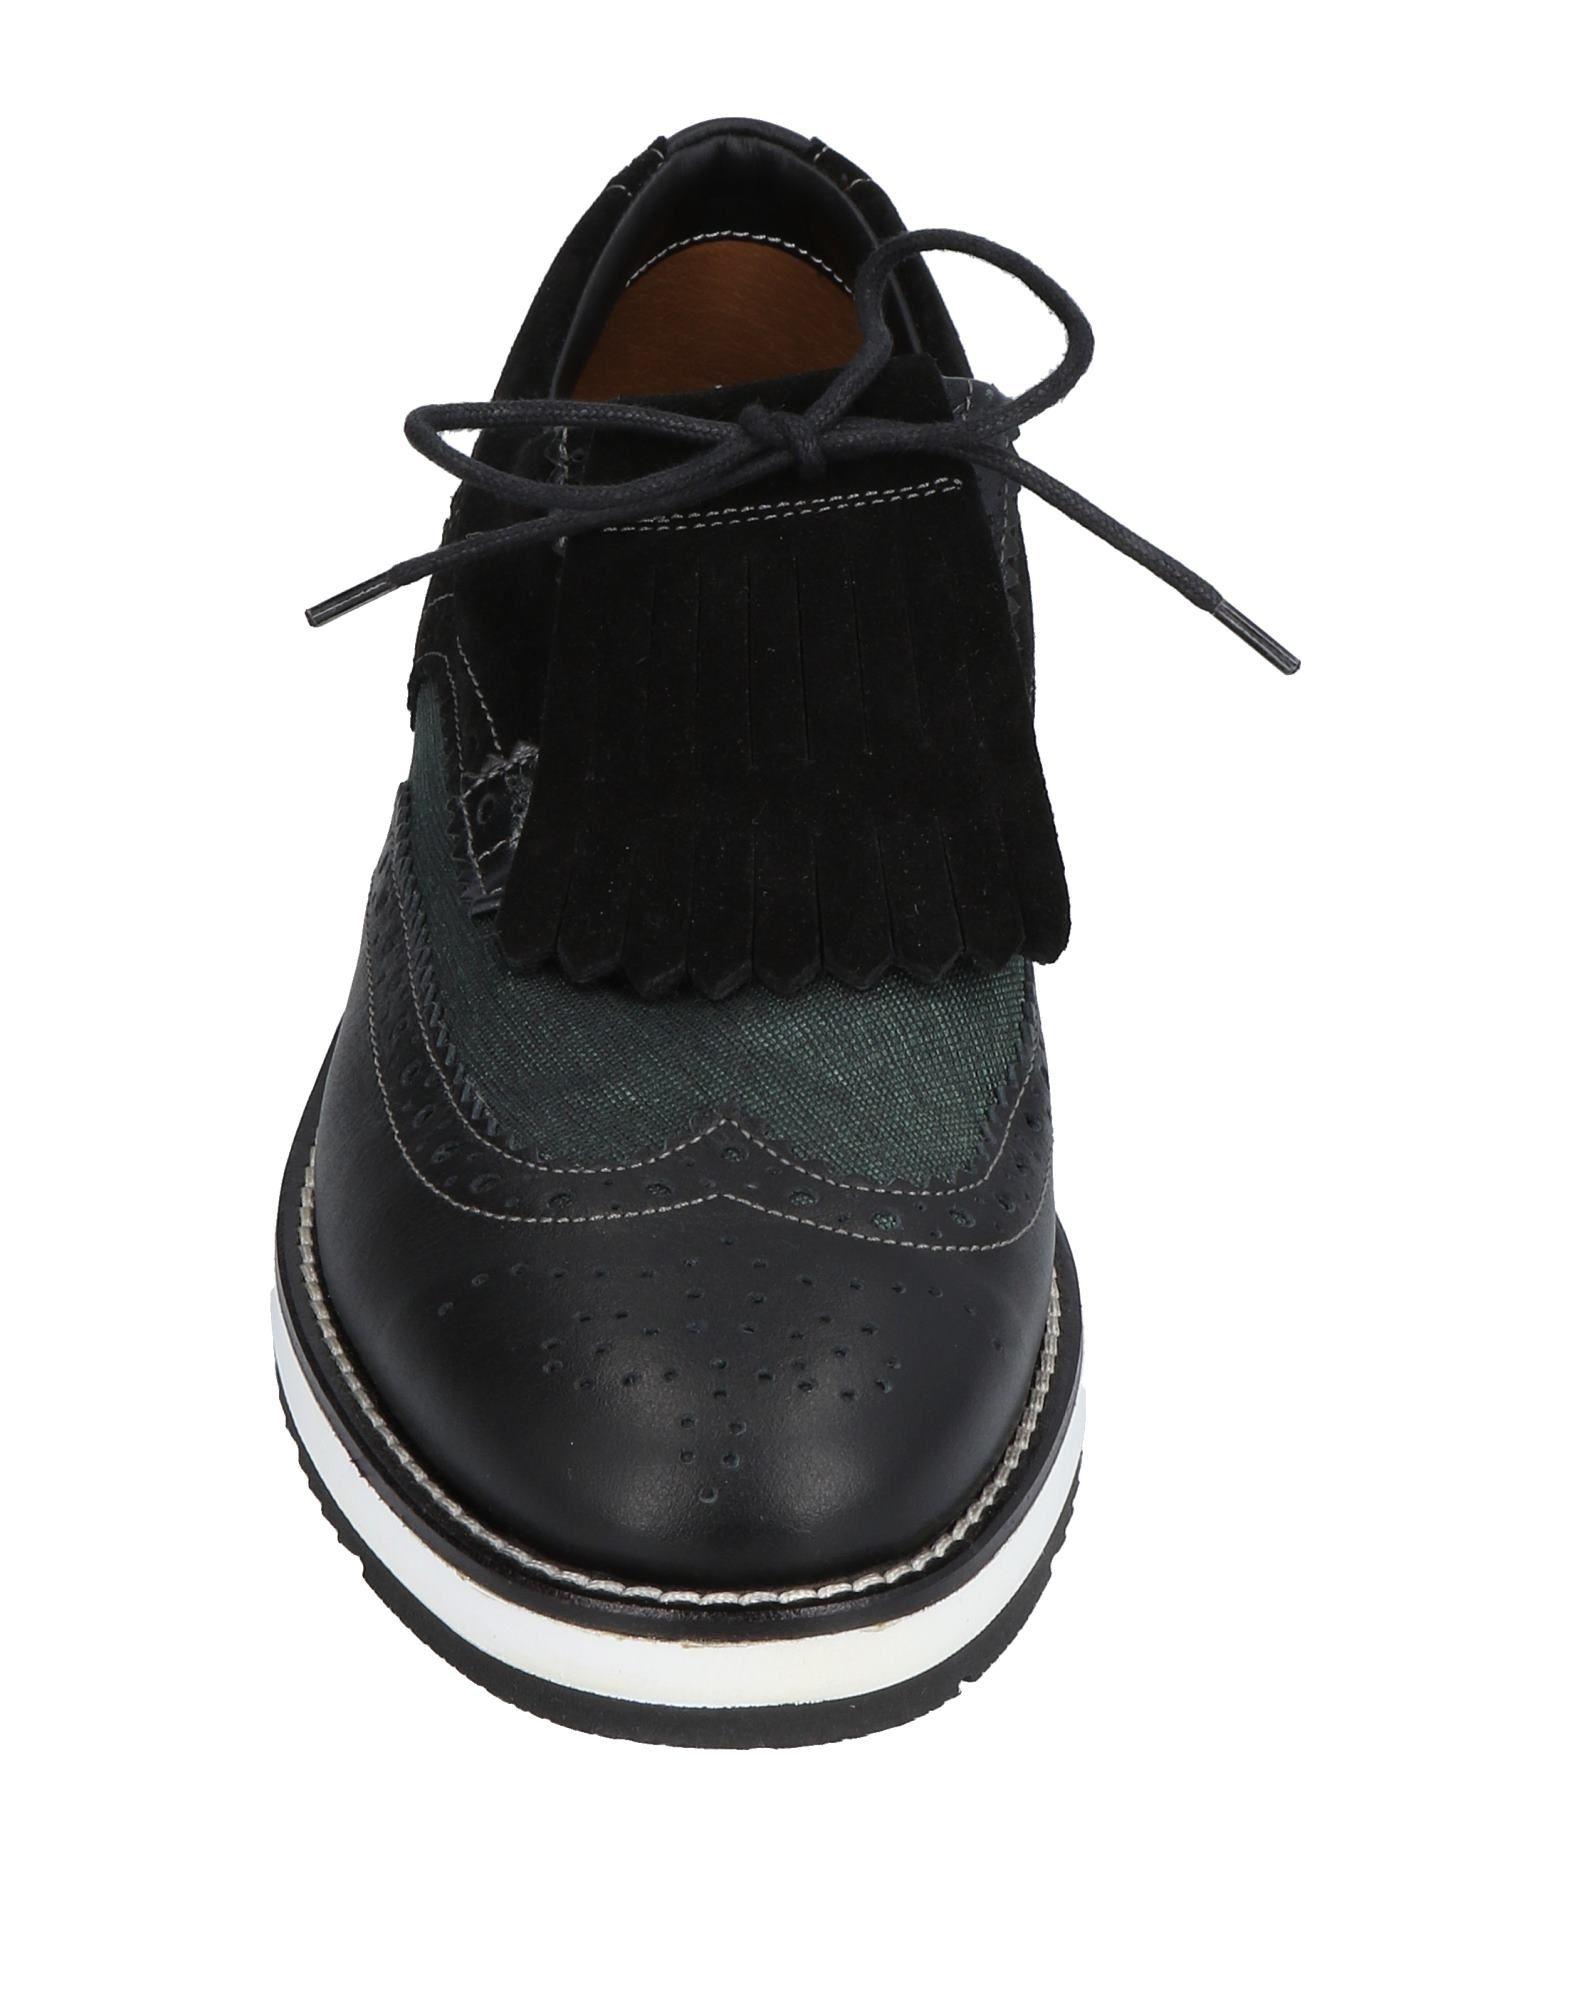 Gut um billige Schuhe Schuhe Schuhe zu tragenBarleycorn Schnürschuhe Damen  11471152KU 4e66b4